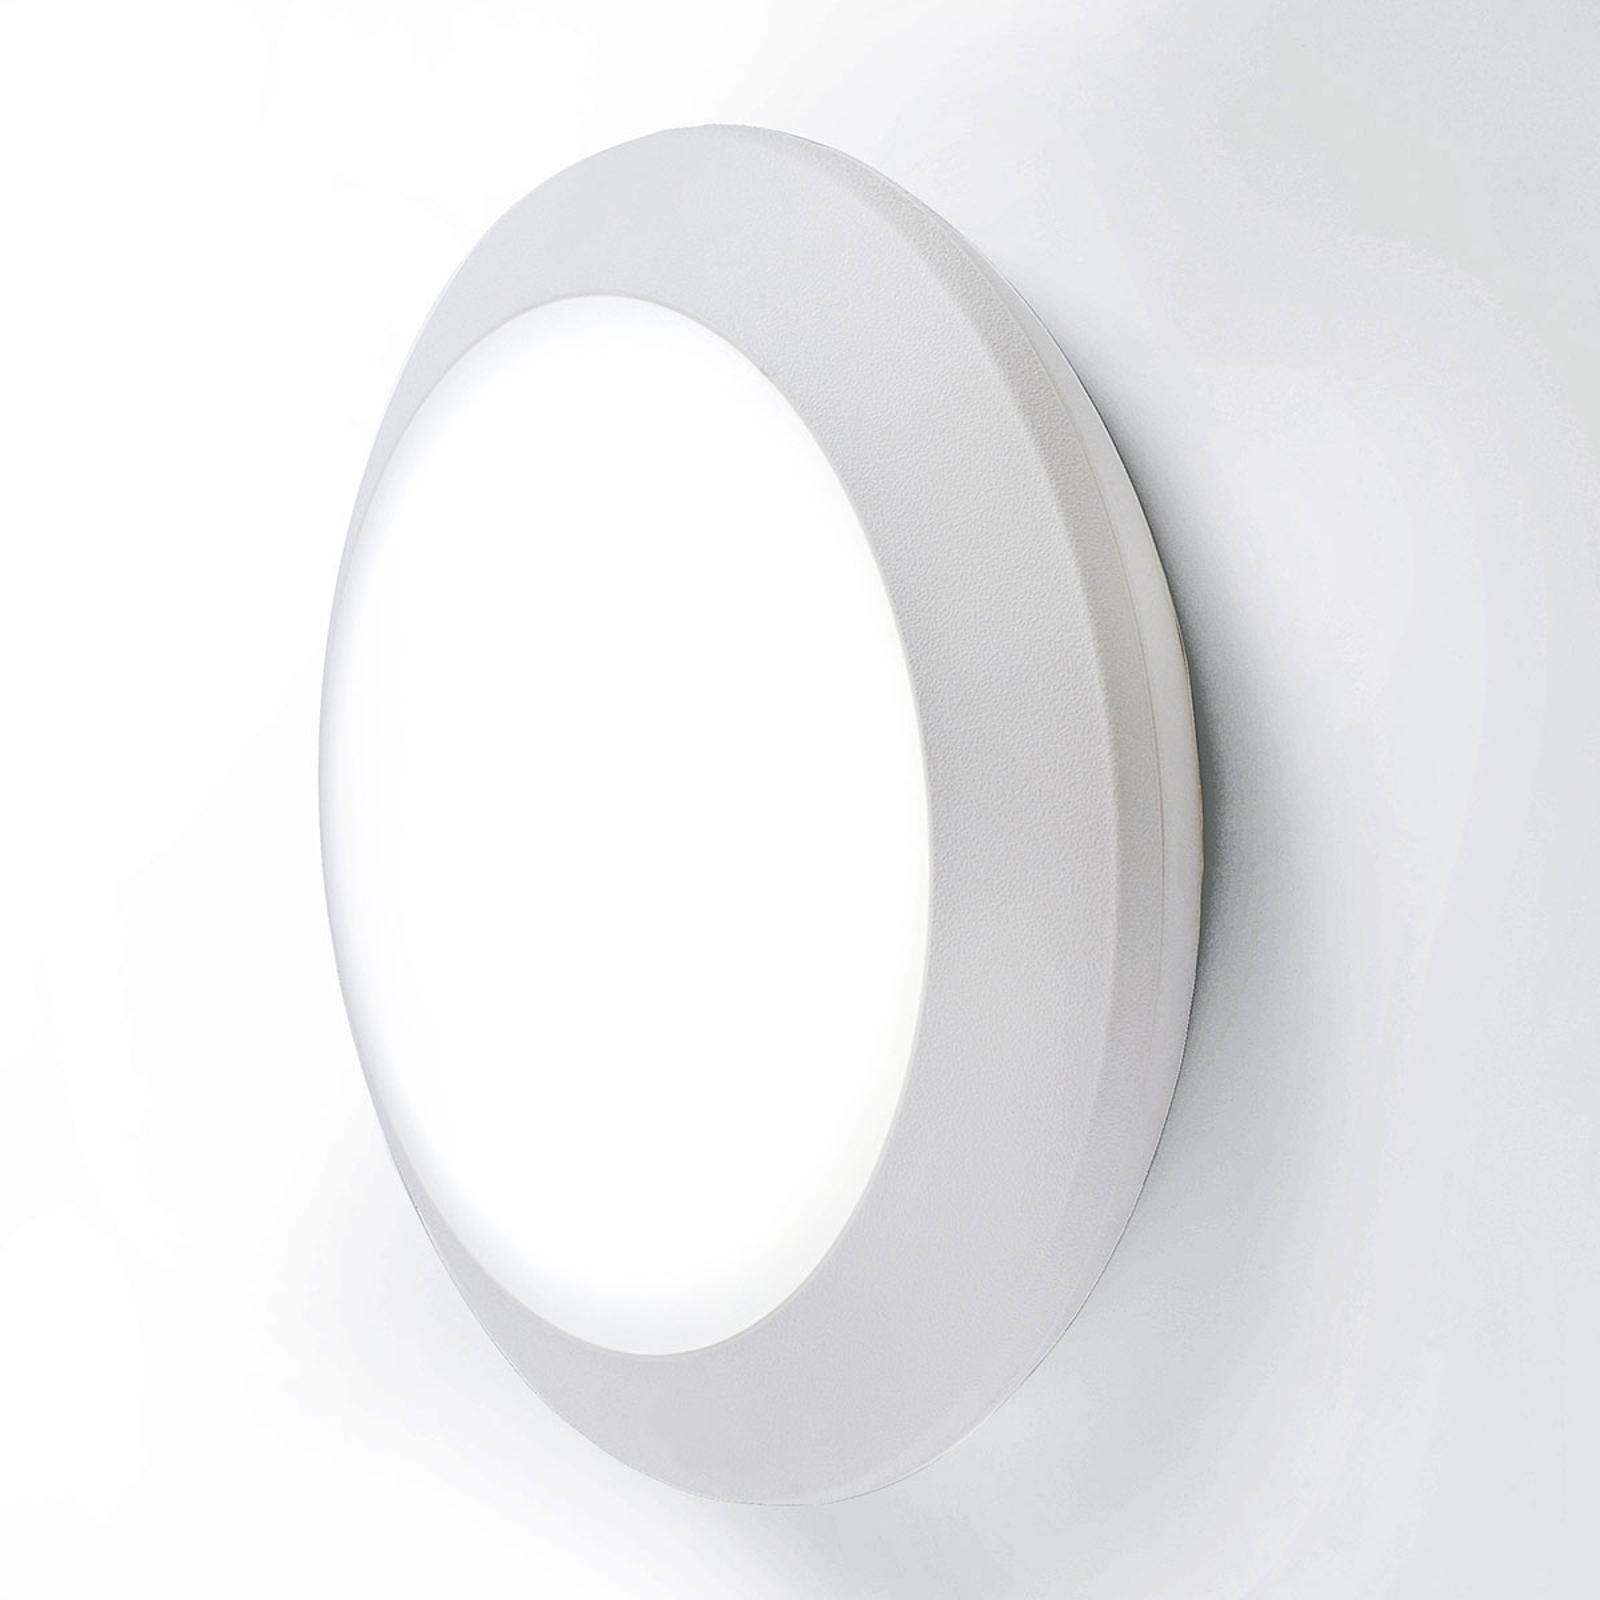 Lampa zewnętrzna LED Berta Ø 27,5 cm biała 11W CCT